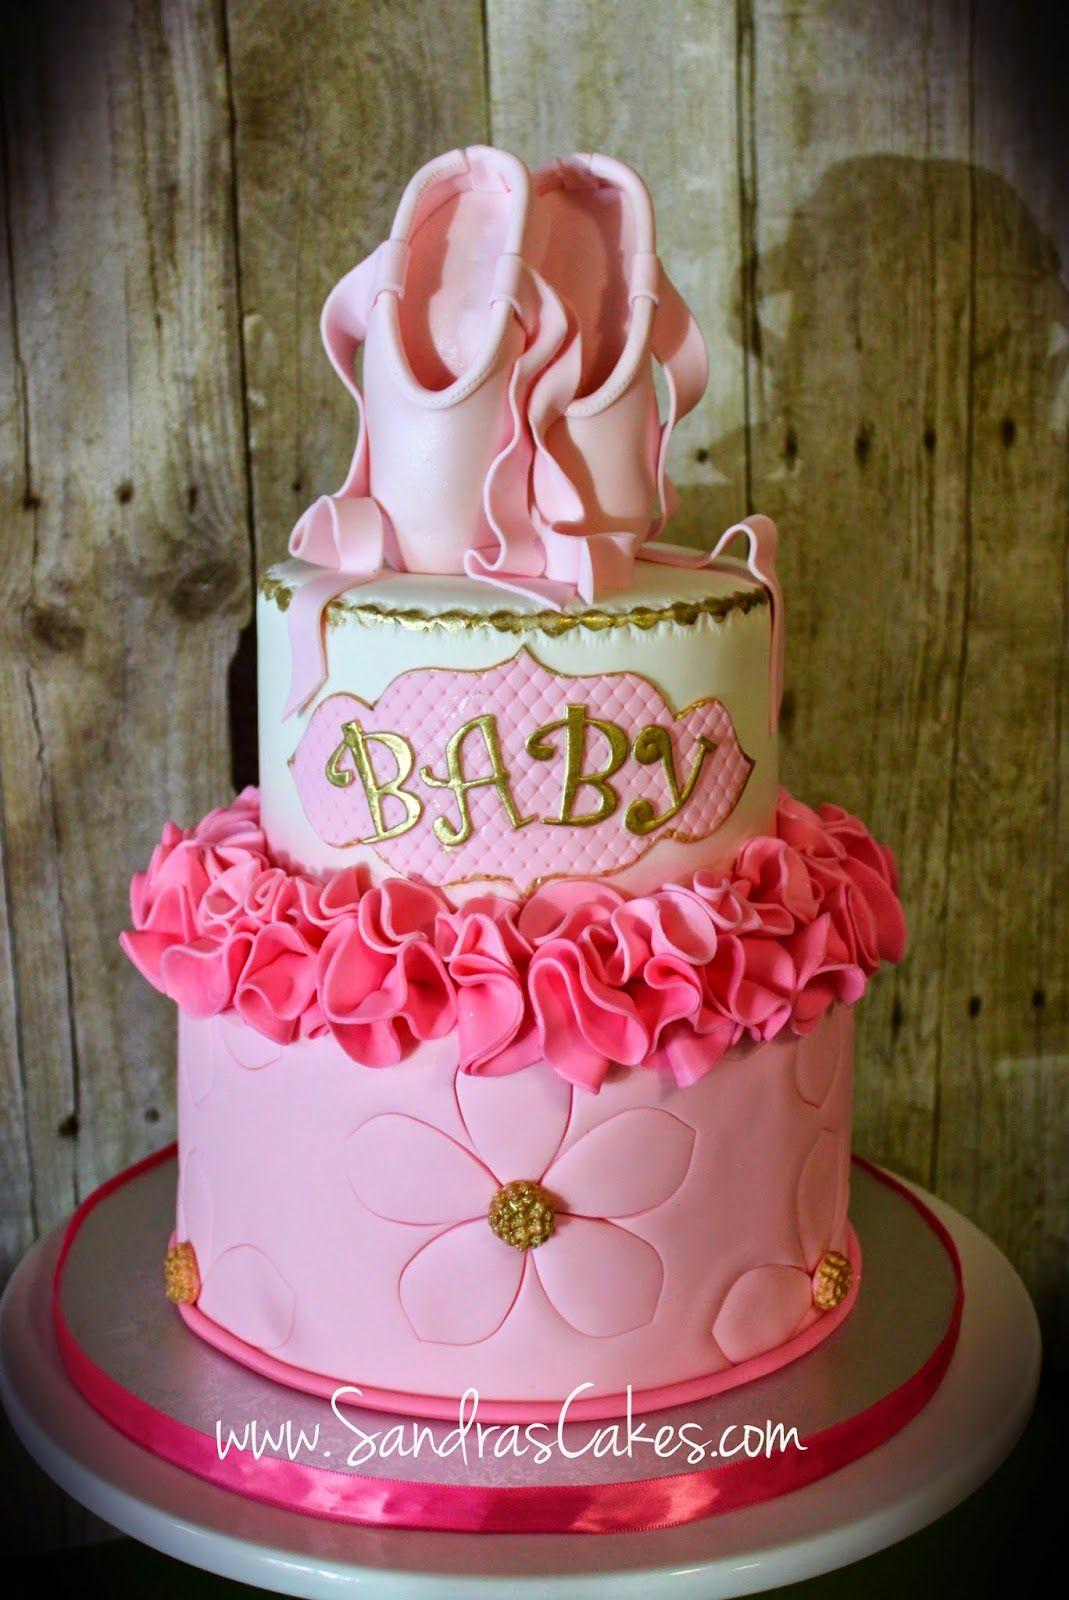 cakes ballerina cakes shoe cakes ballerina party cakes baby showers